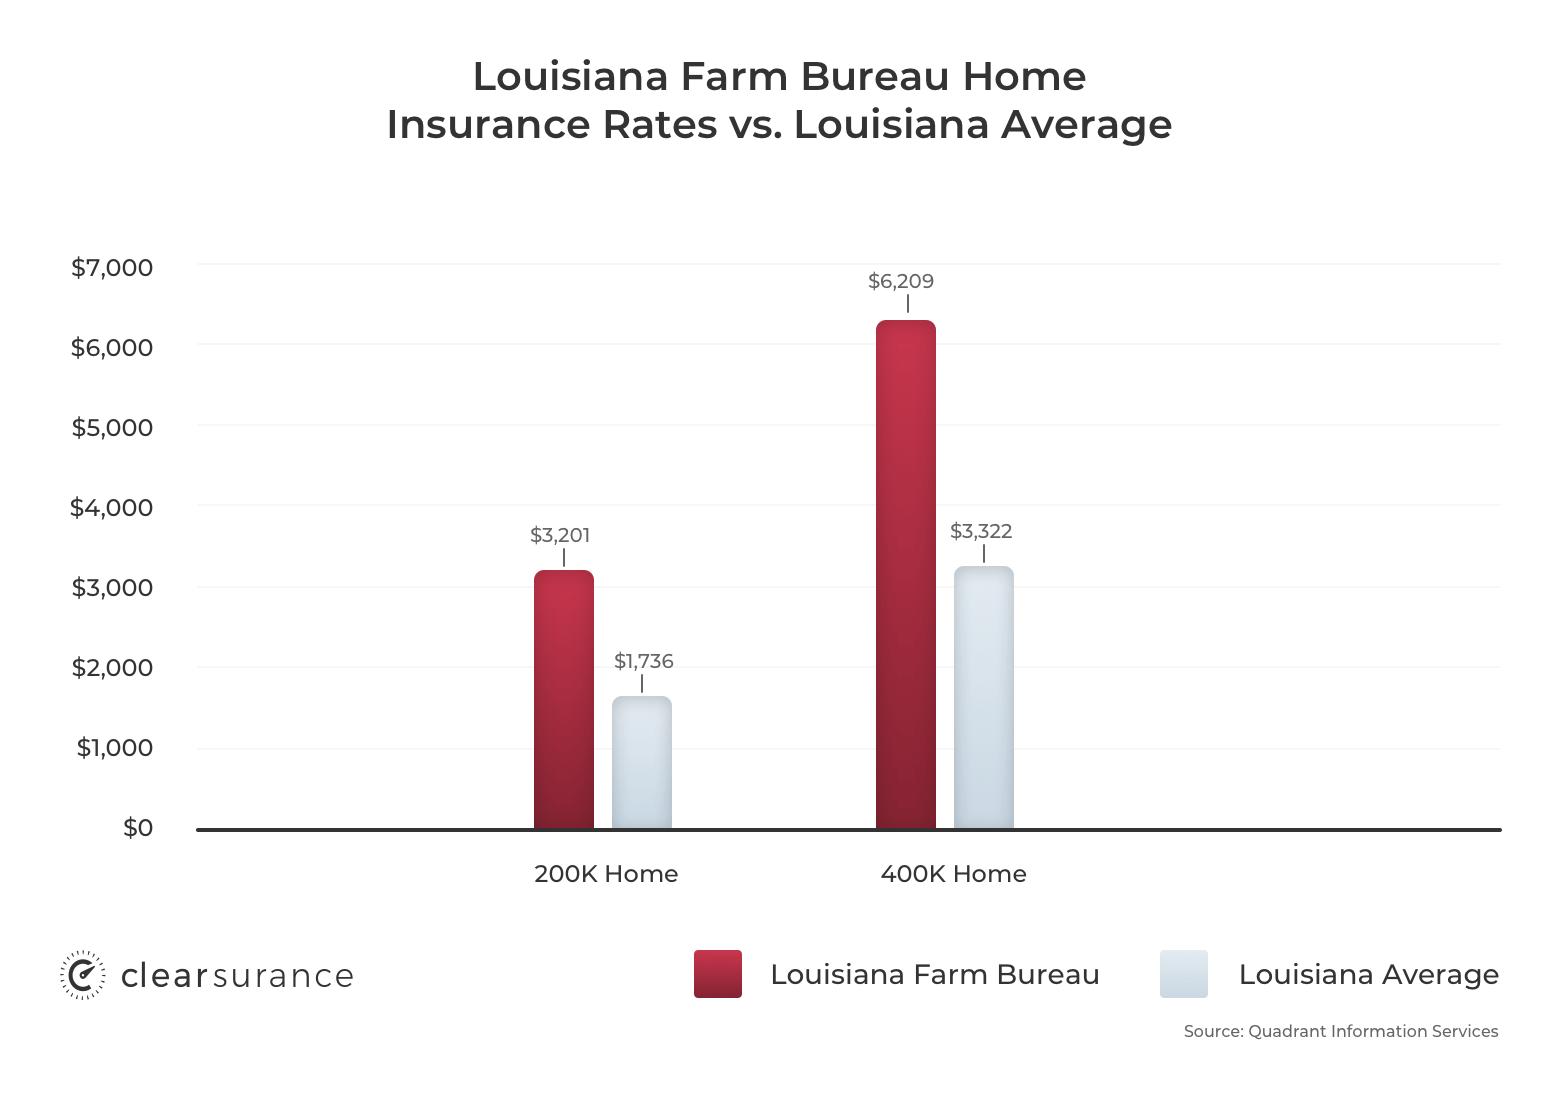 Louisiana Farm Bureau homeowners insurance rates